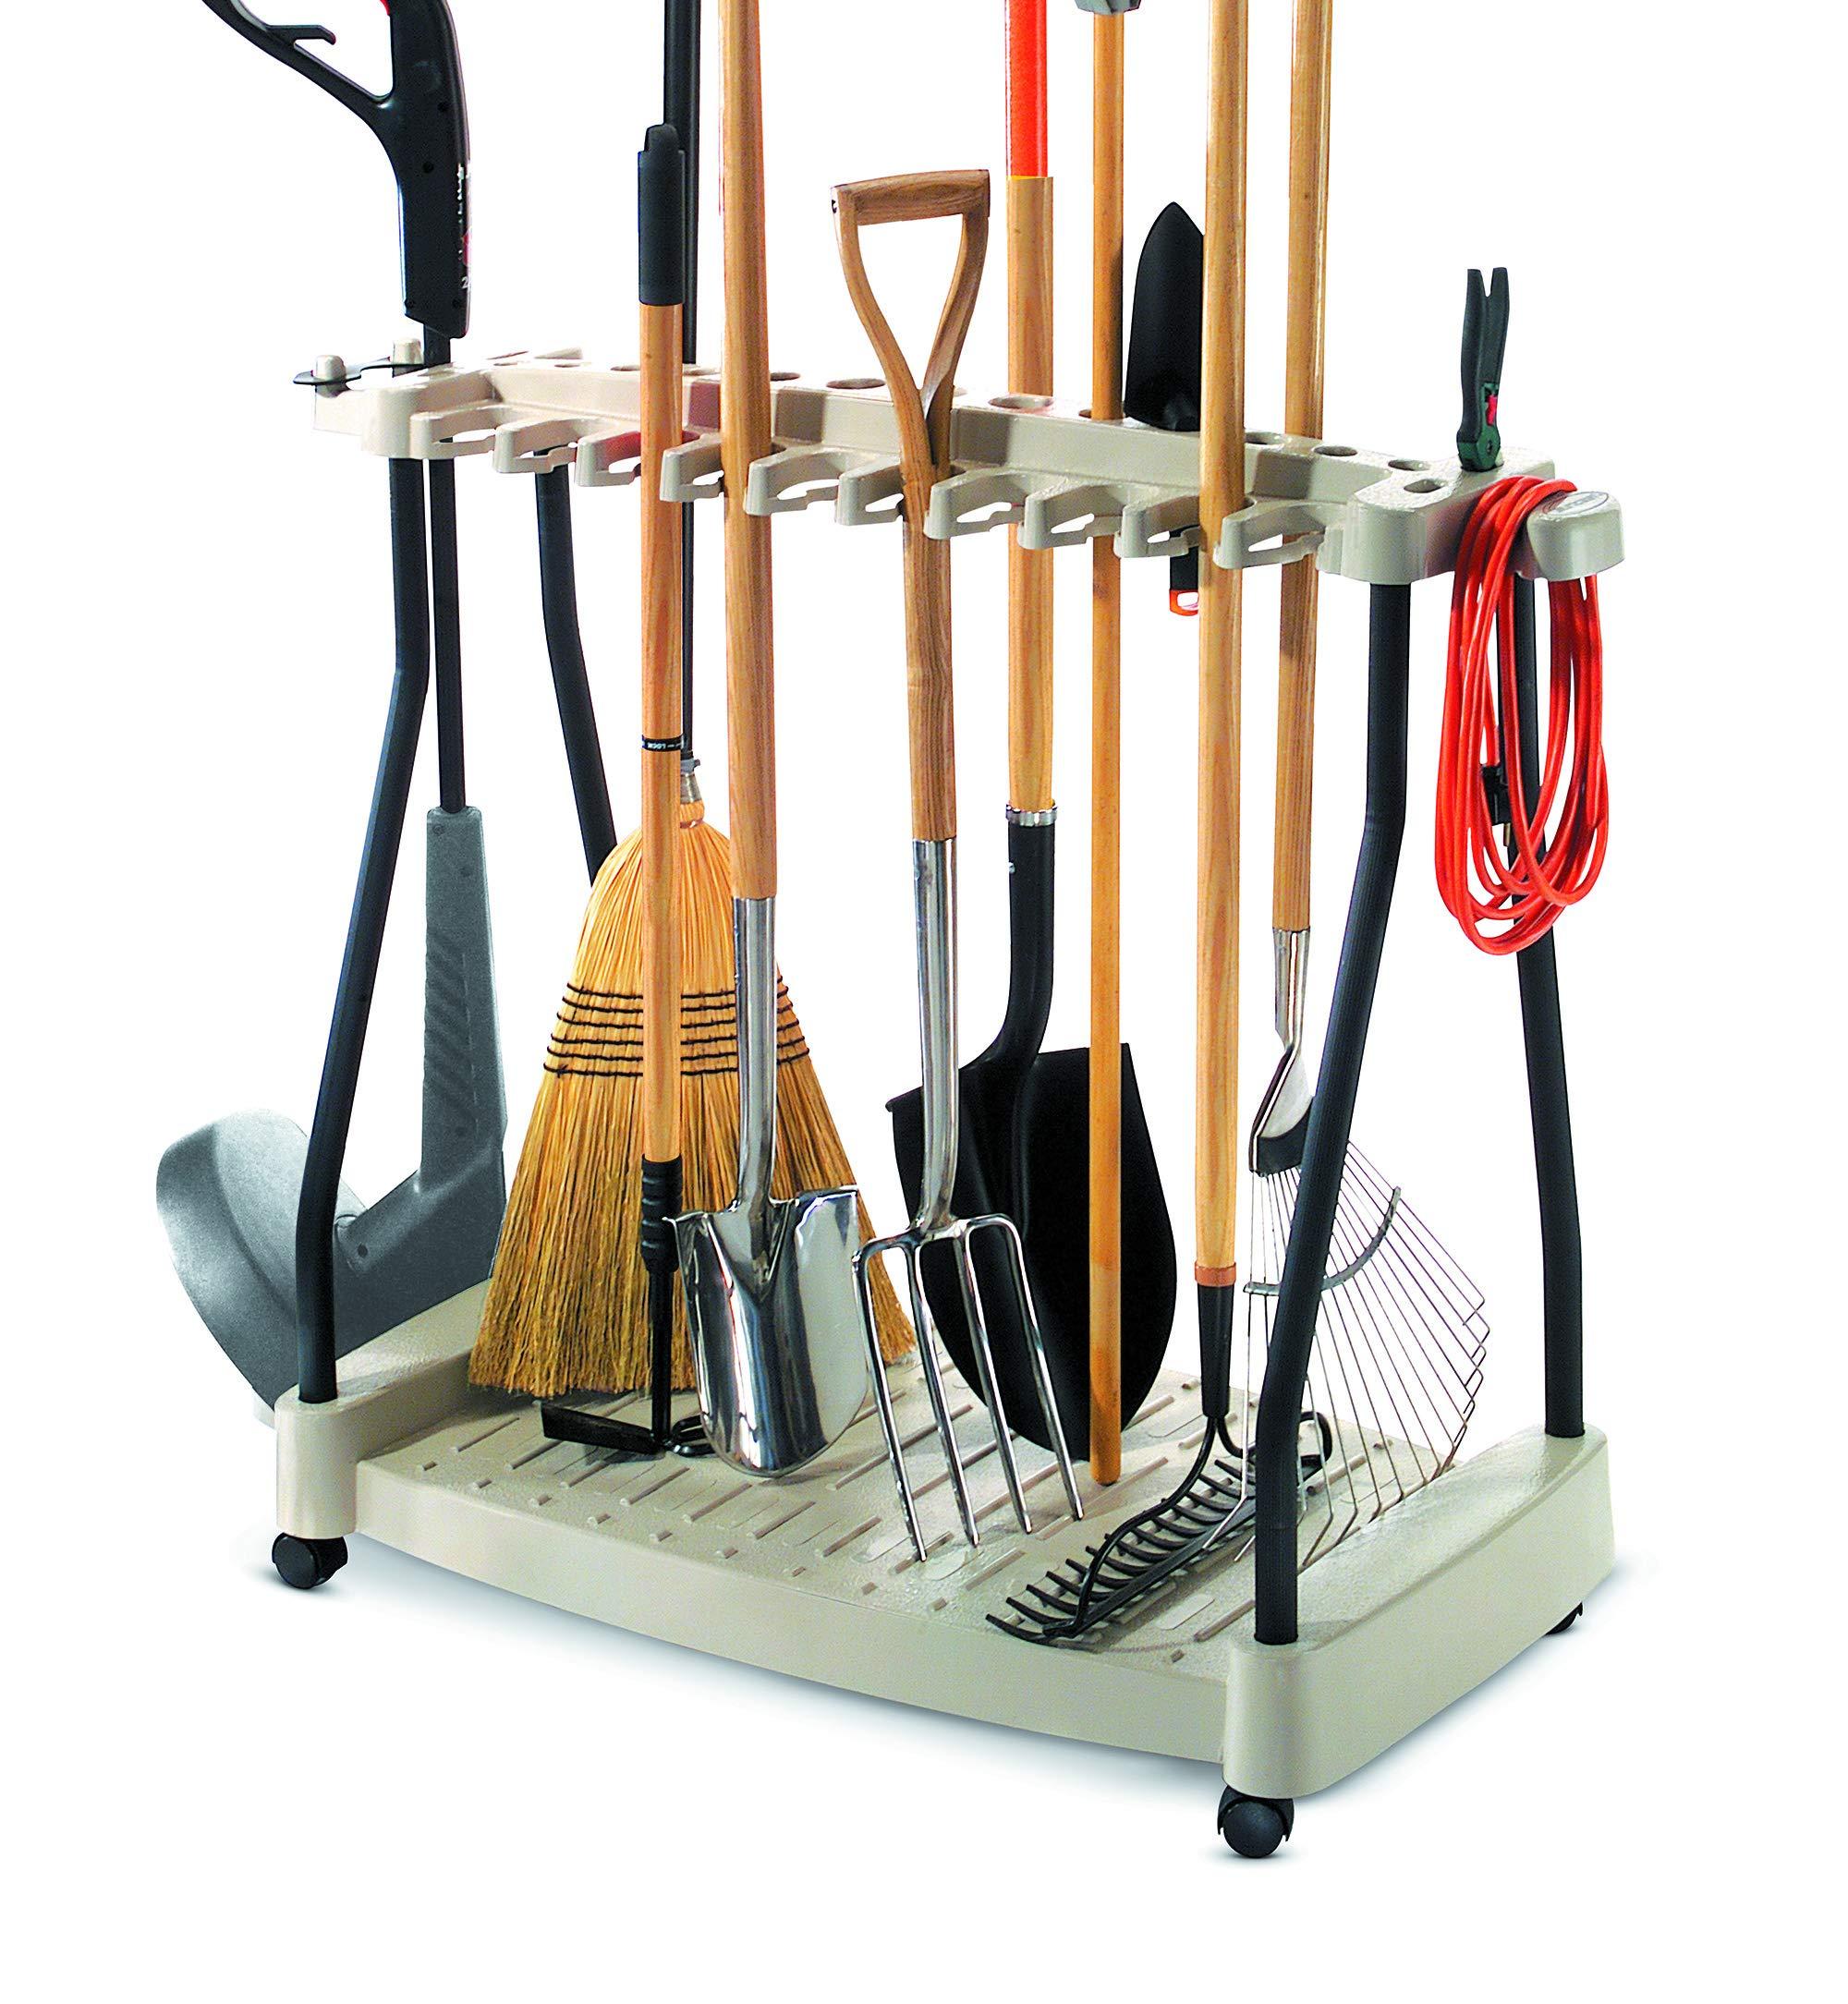 SD490 Capacity Lift Plate-Made In USA Organize /& Store Lawn /& Garden Tool Garage Storage Rack /& Yard Cart Garden Wheelbarrow Wagon SuperDuty Lawn /& Garden ToolBox on Never Flat Wheels /& 120 Lb